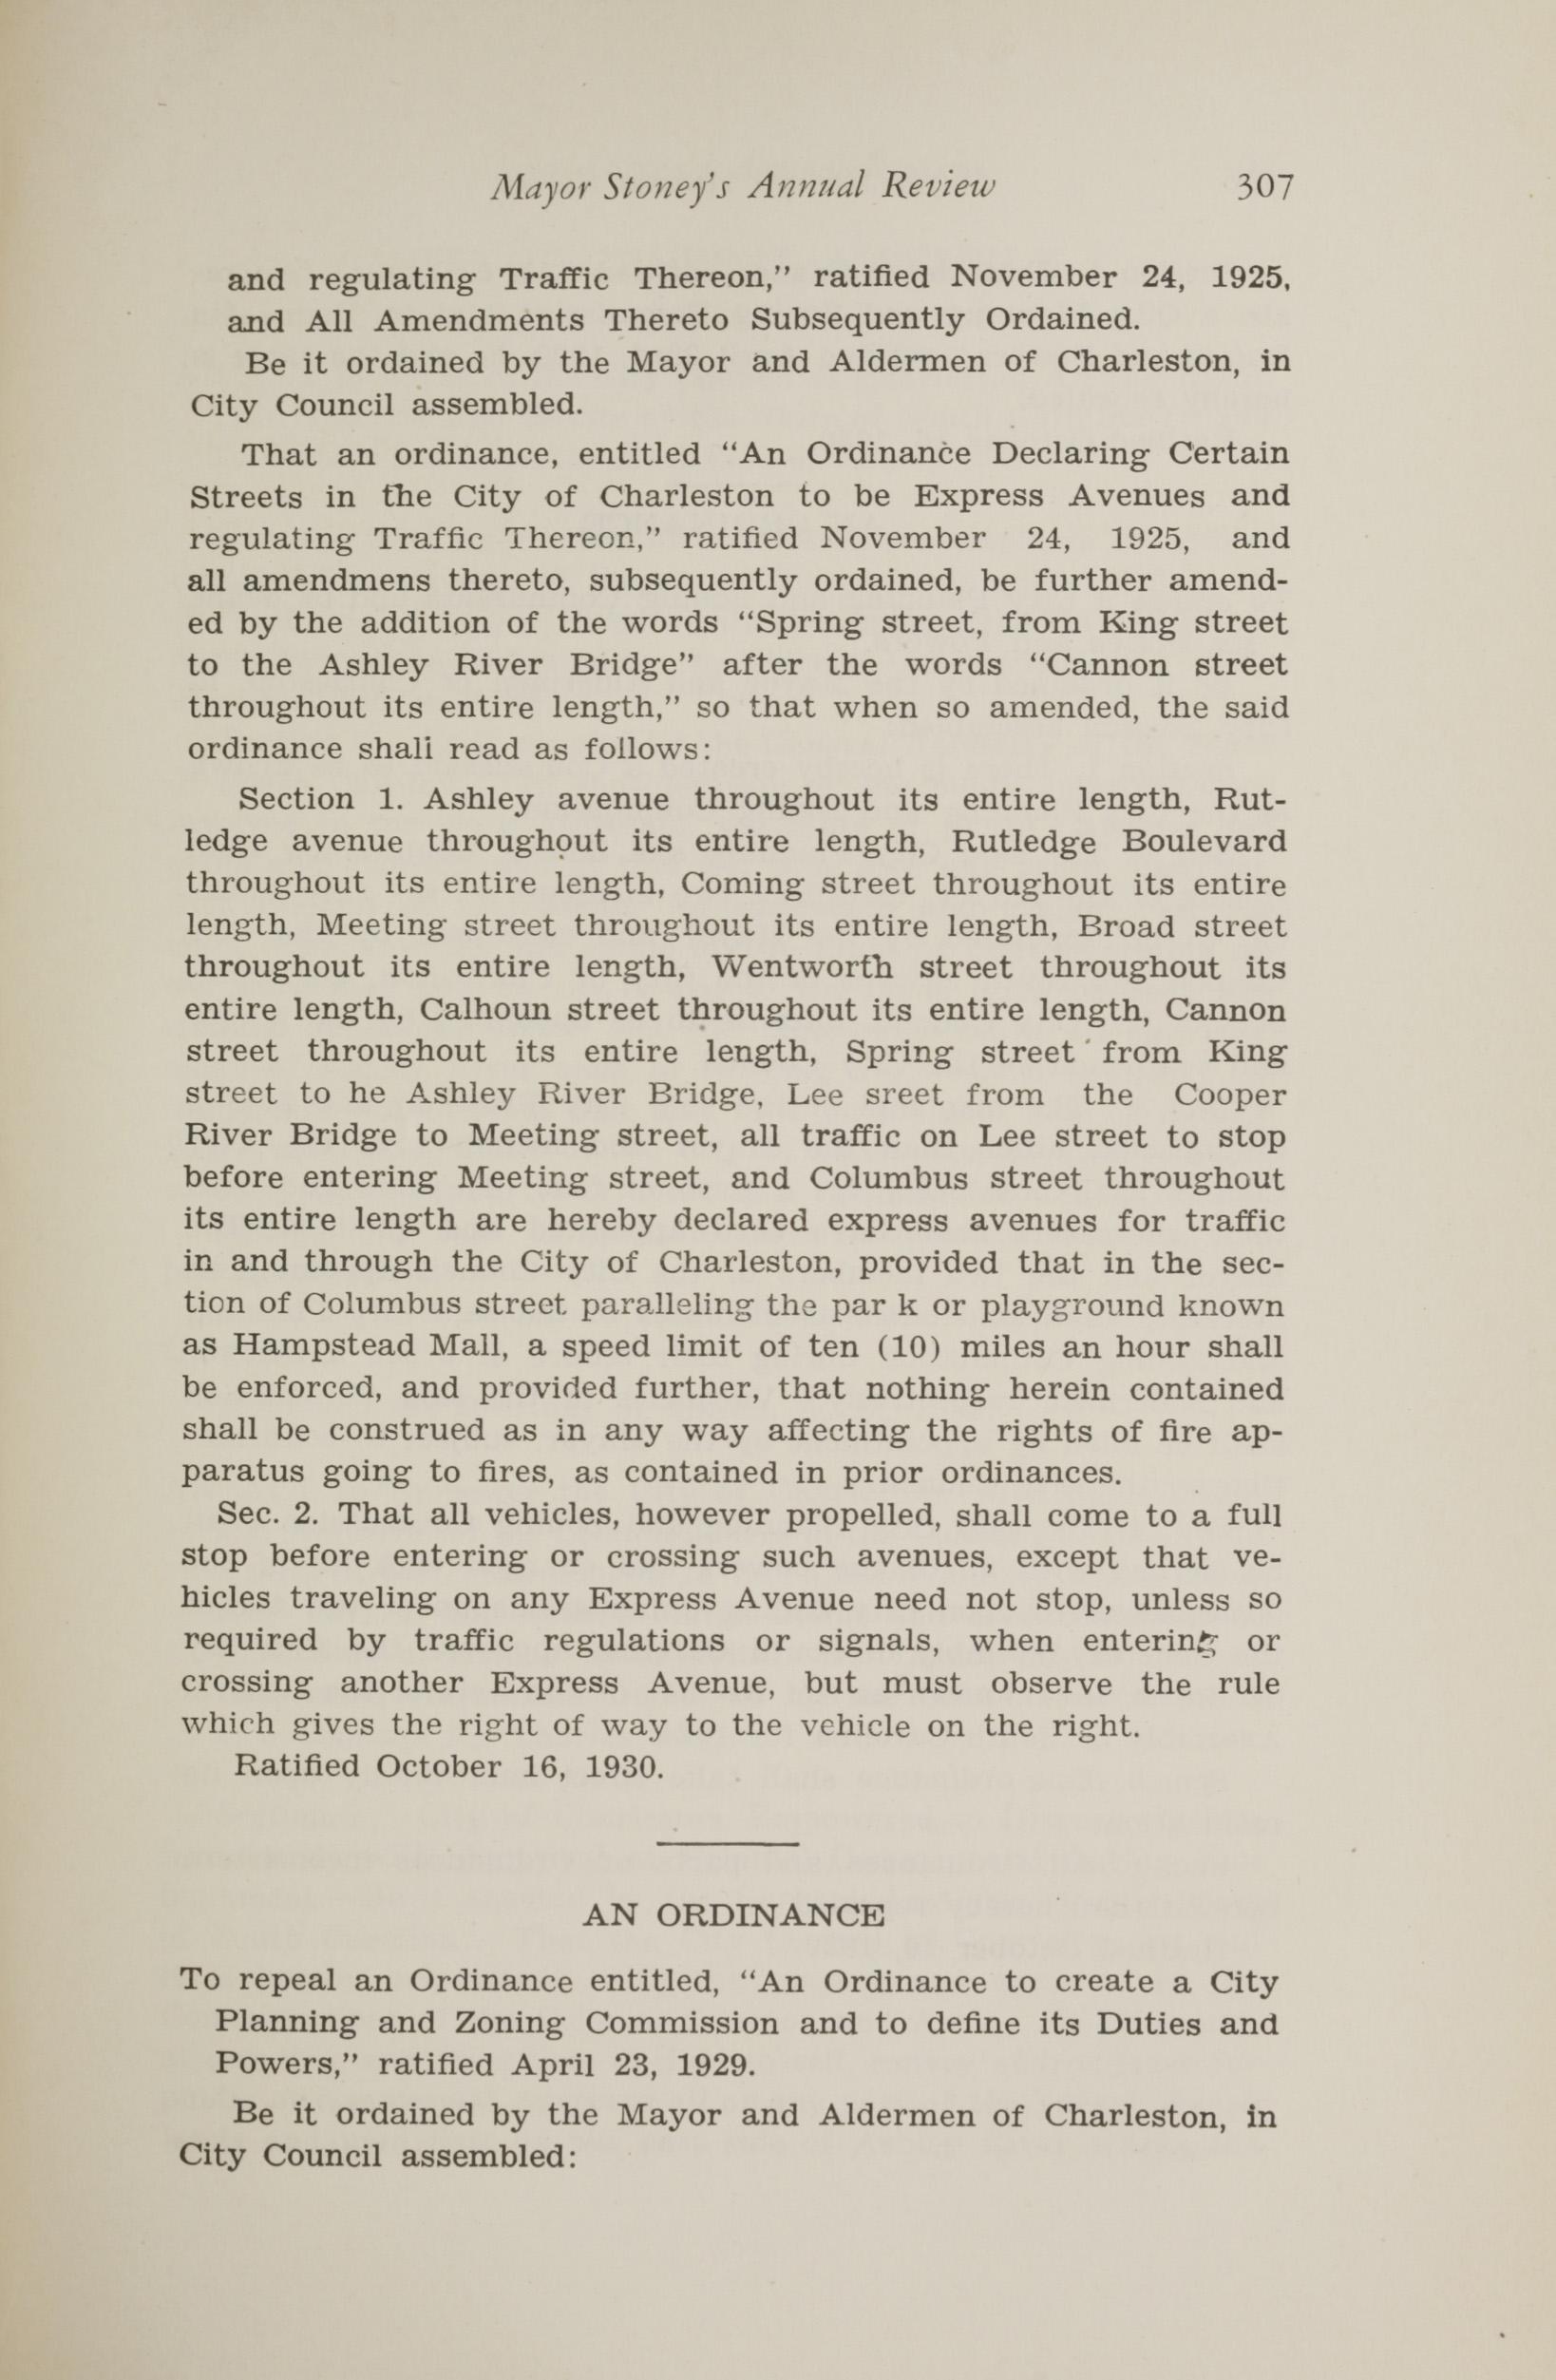 Charleston Yearbook, 1930, page 307